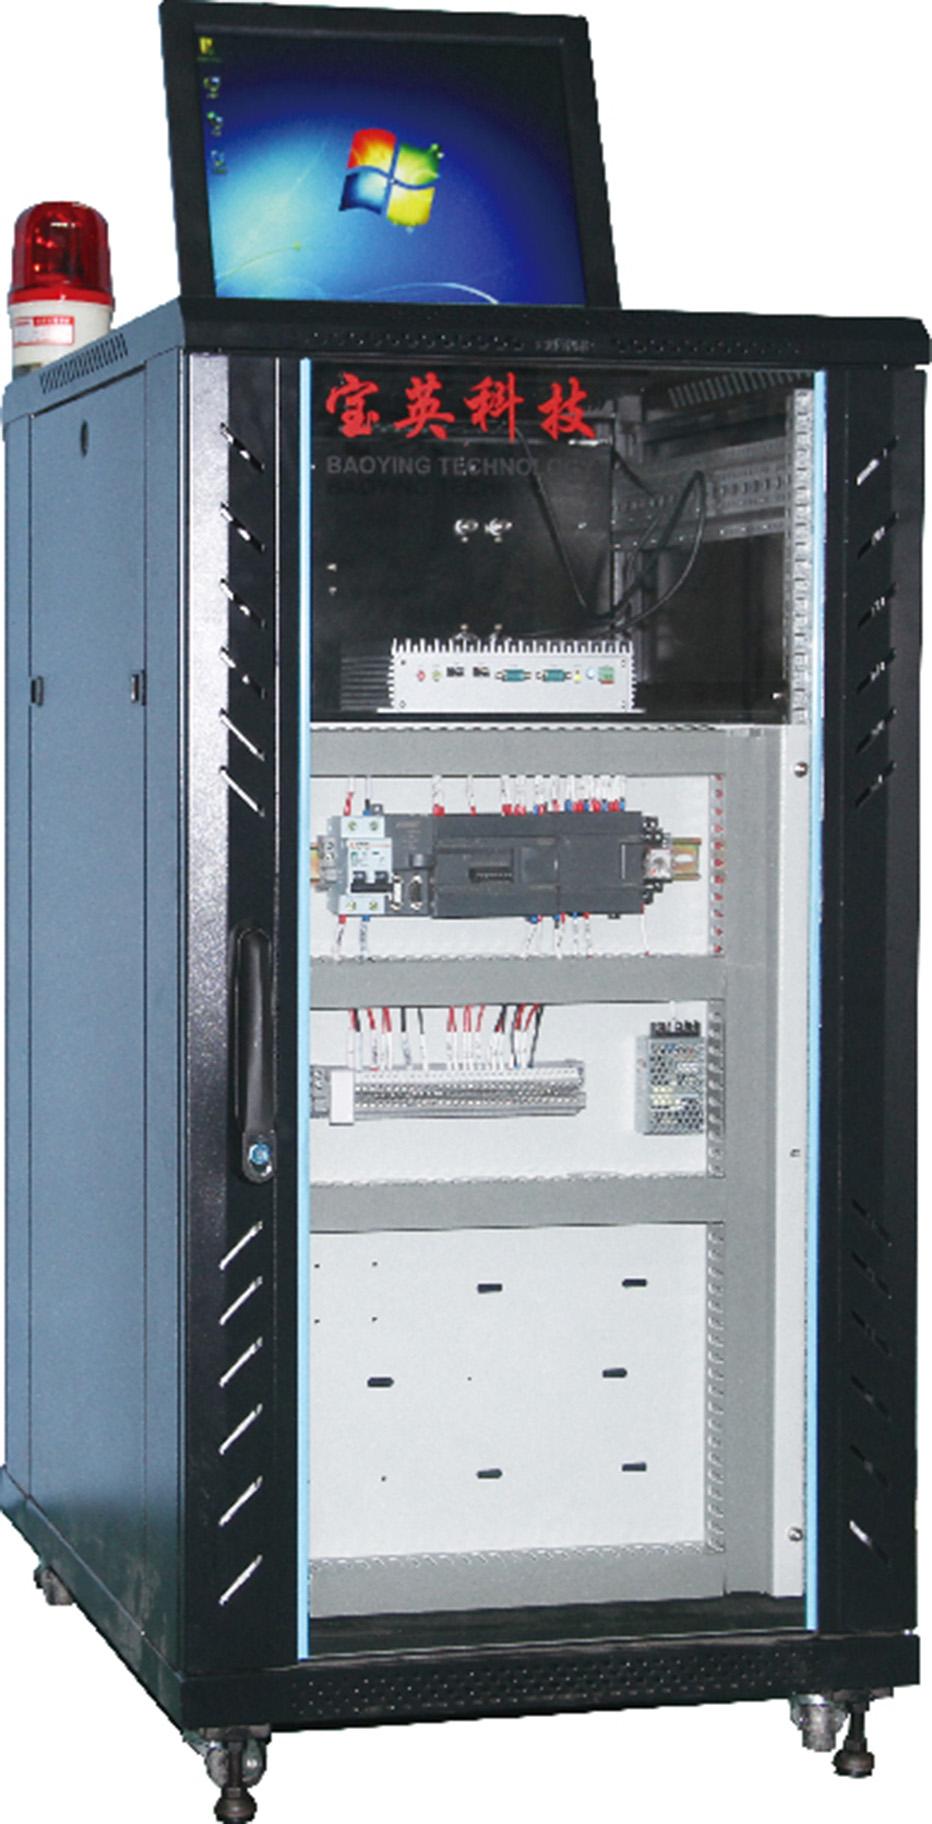 BY-VOC-600P型挥发性有机物在线监测系统